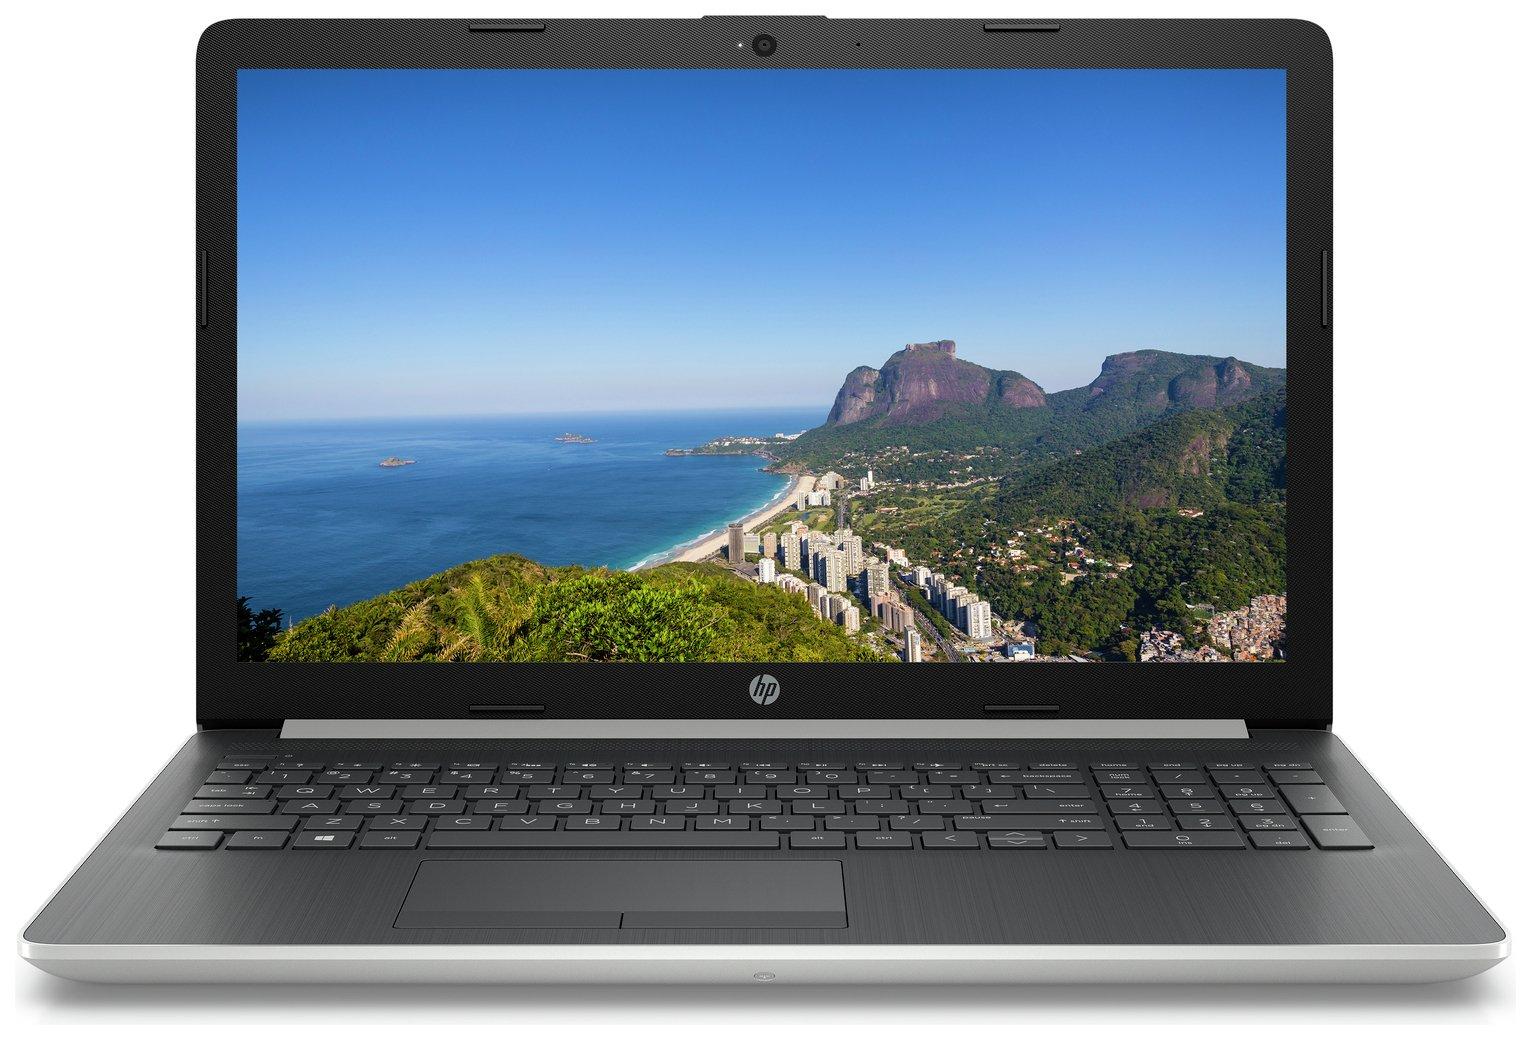 HP 17 Inch i5 4GB + 16GB Optane 1TB Laptop - Silver